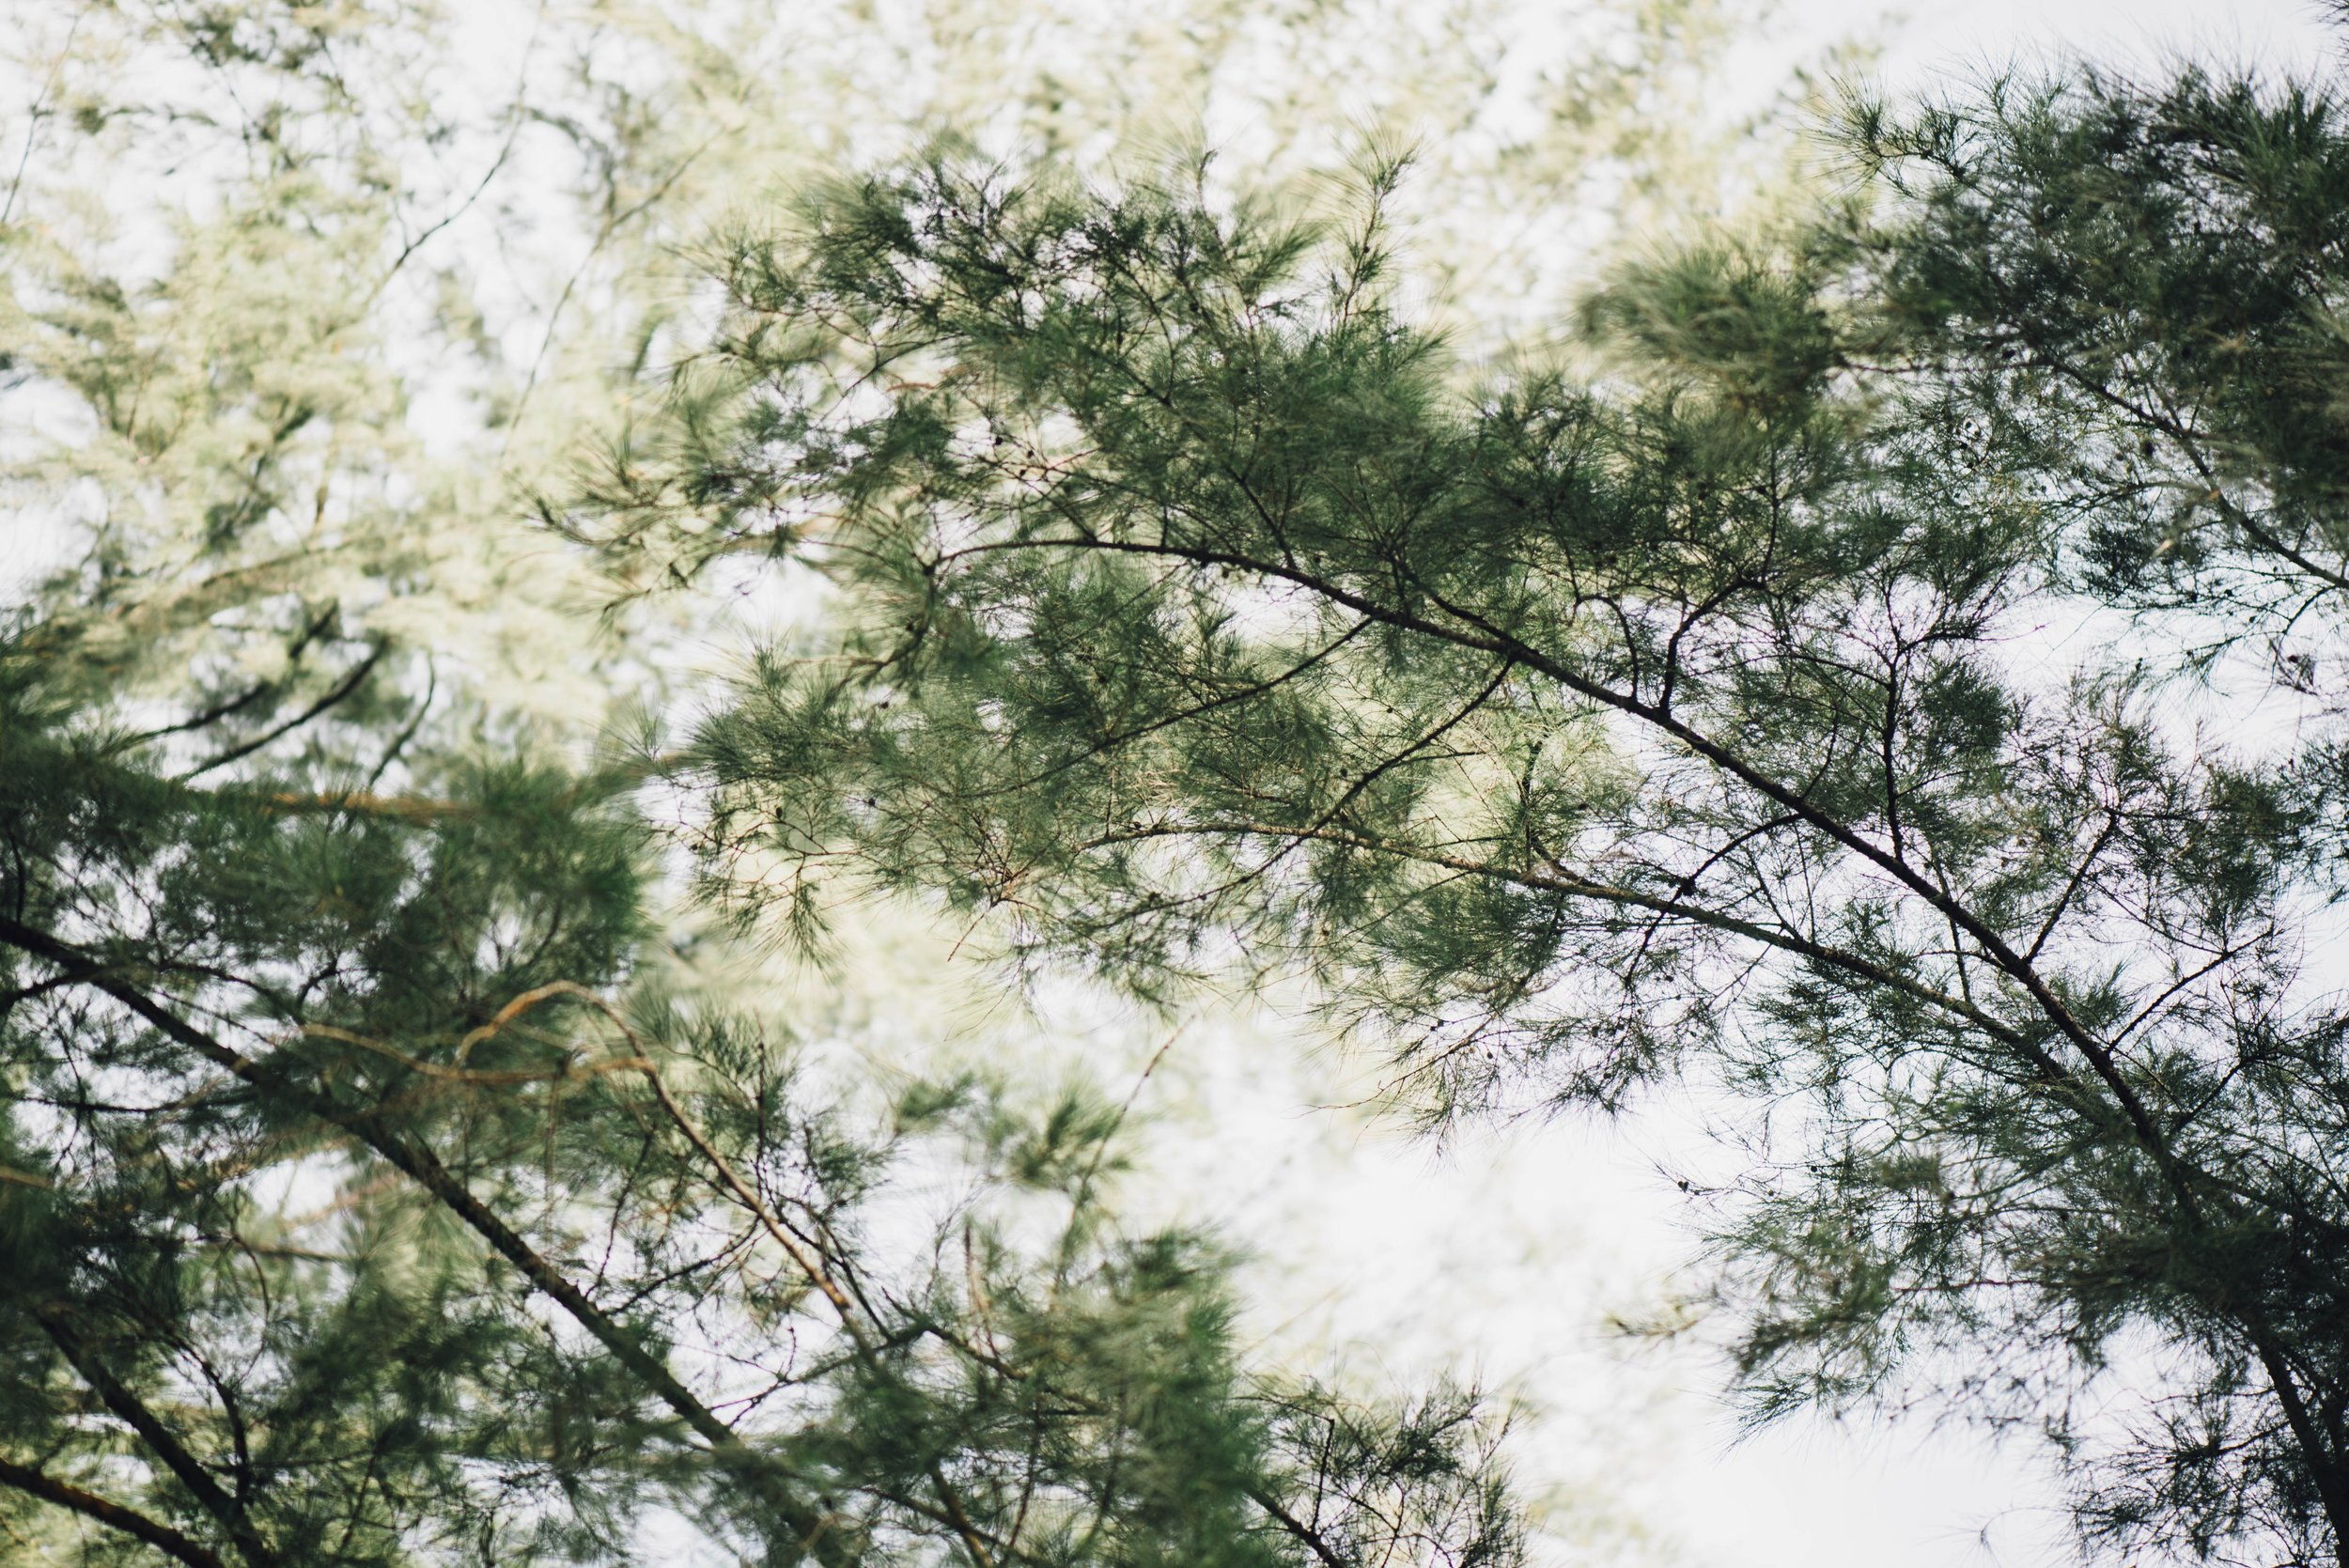 FOREST_3.jpg